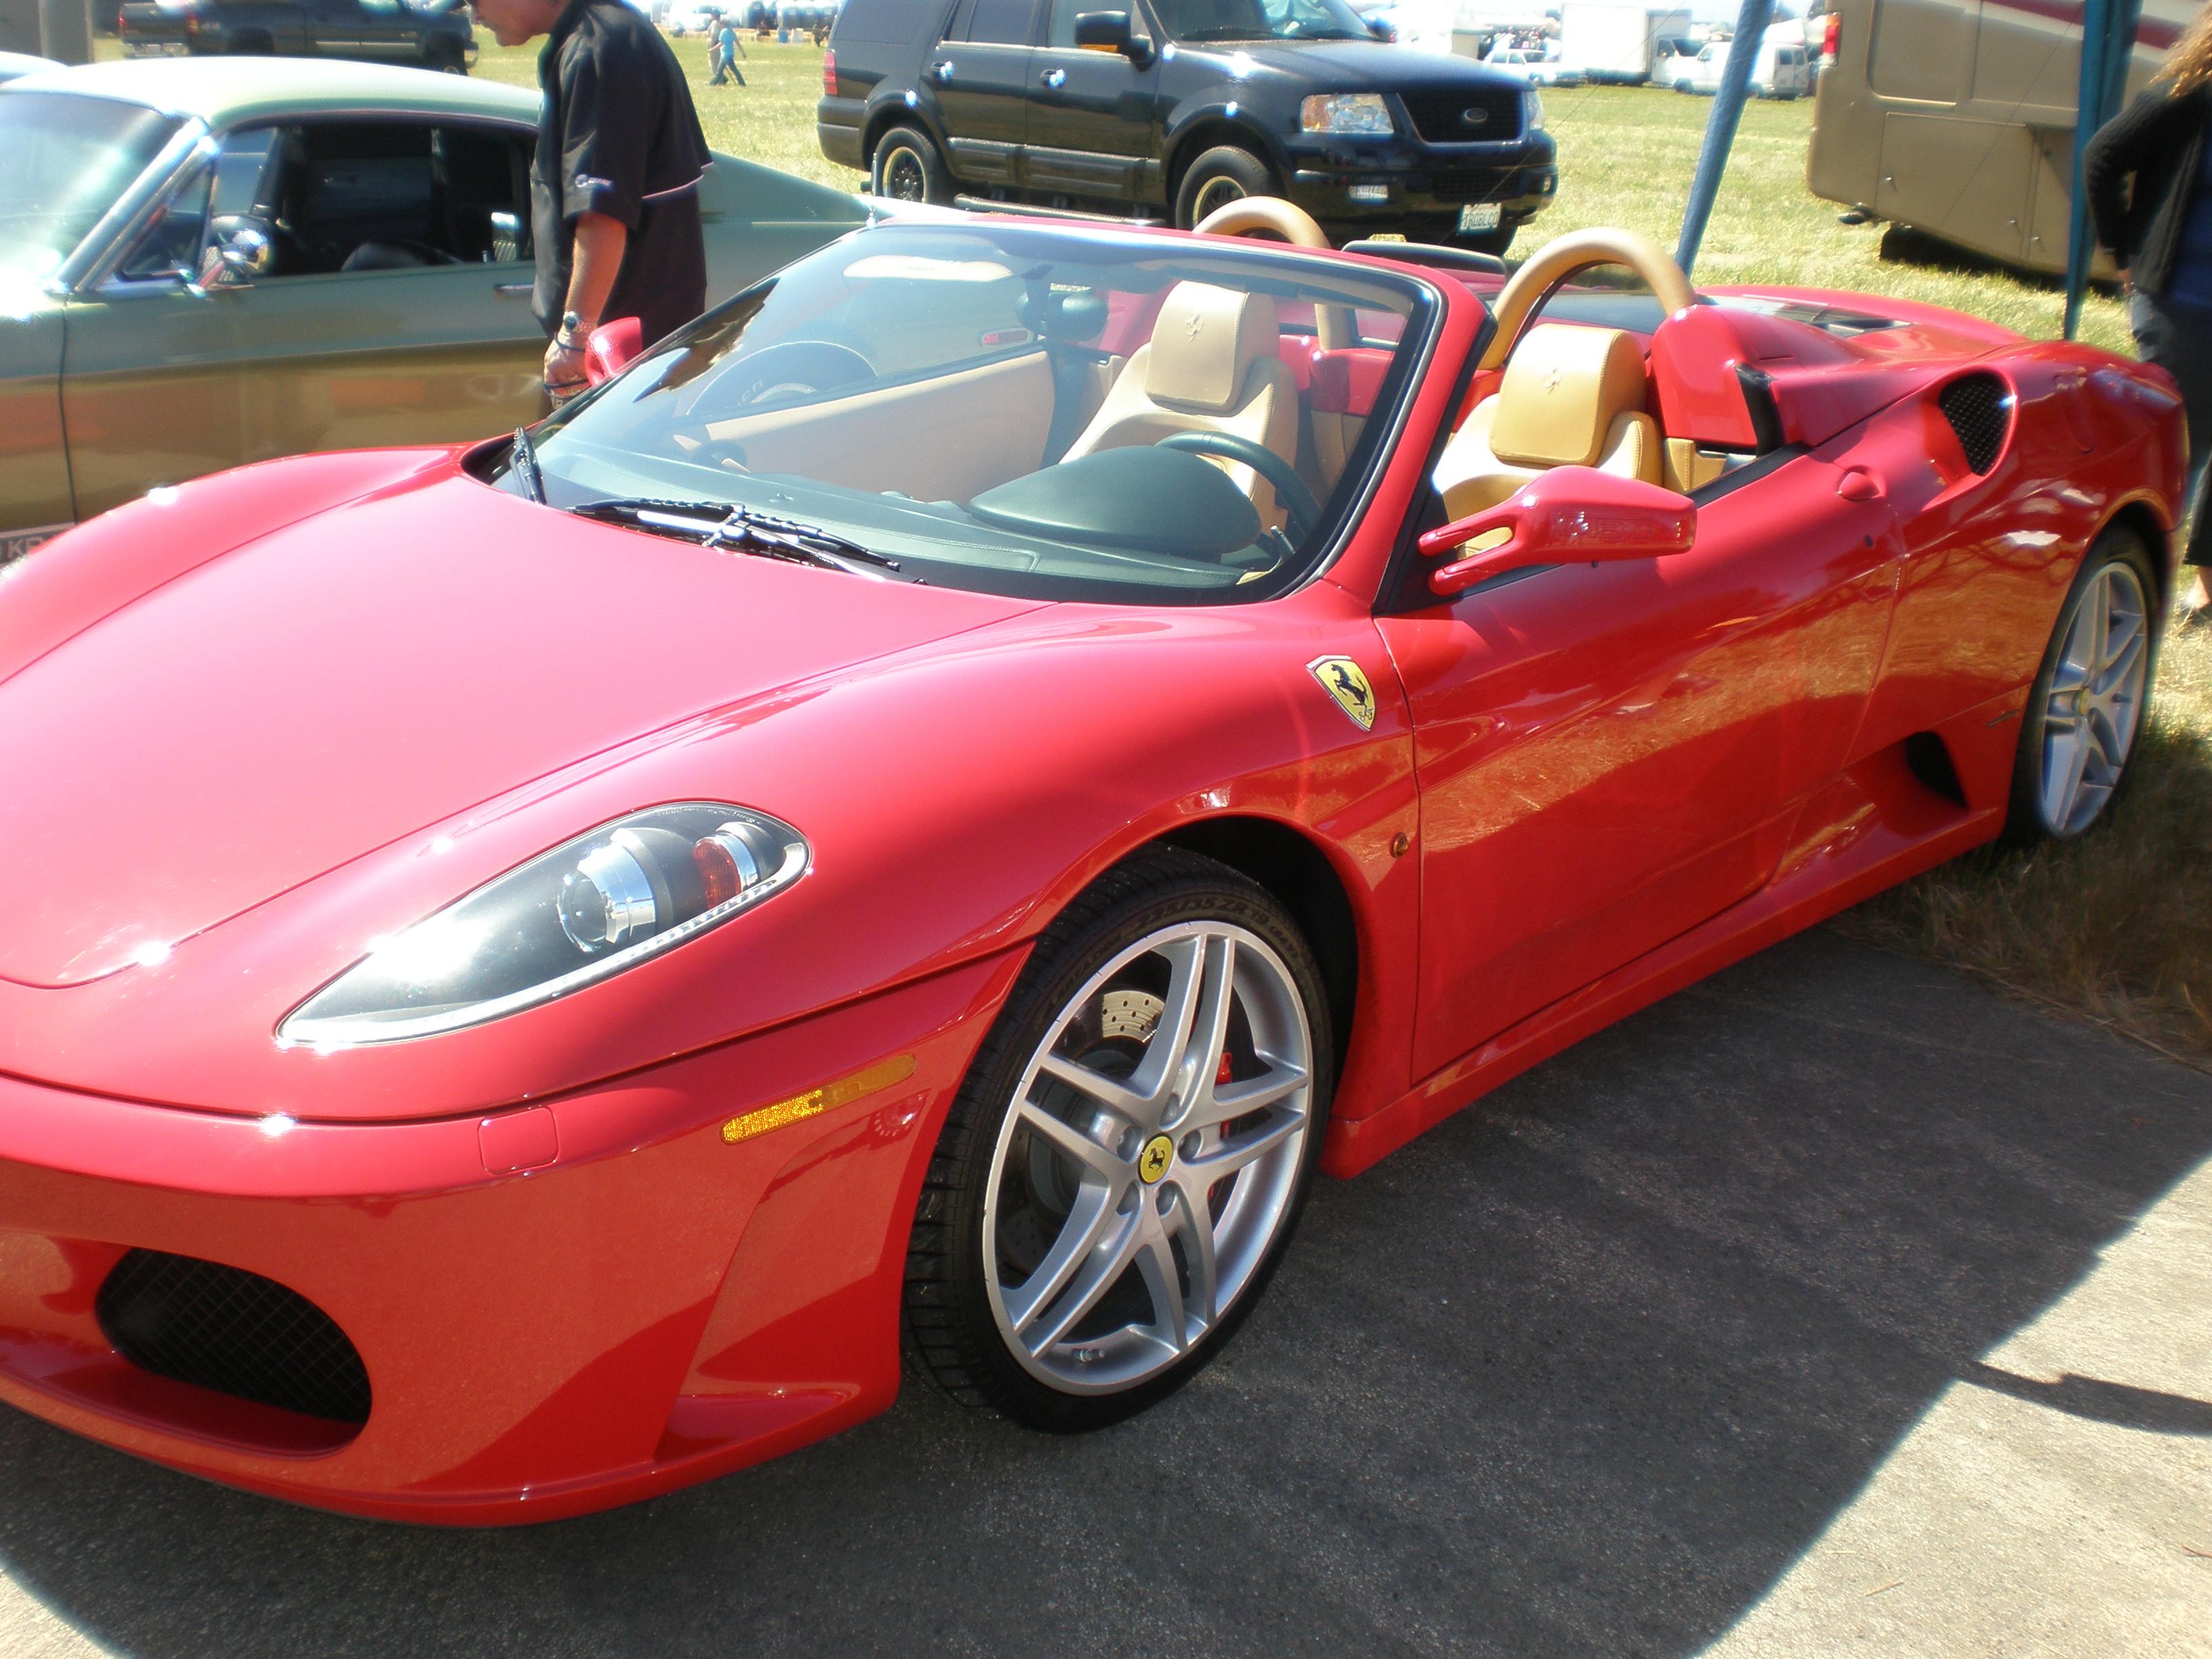 Red Ferrari F430 Spider